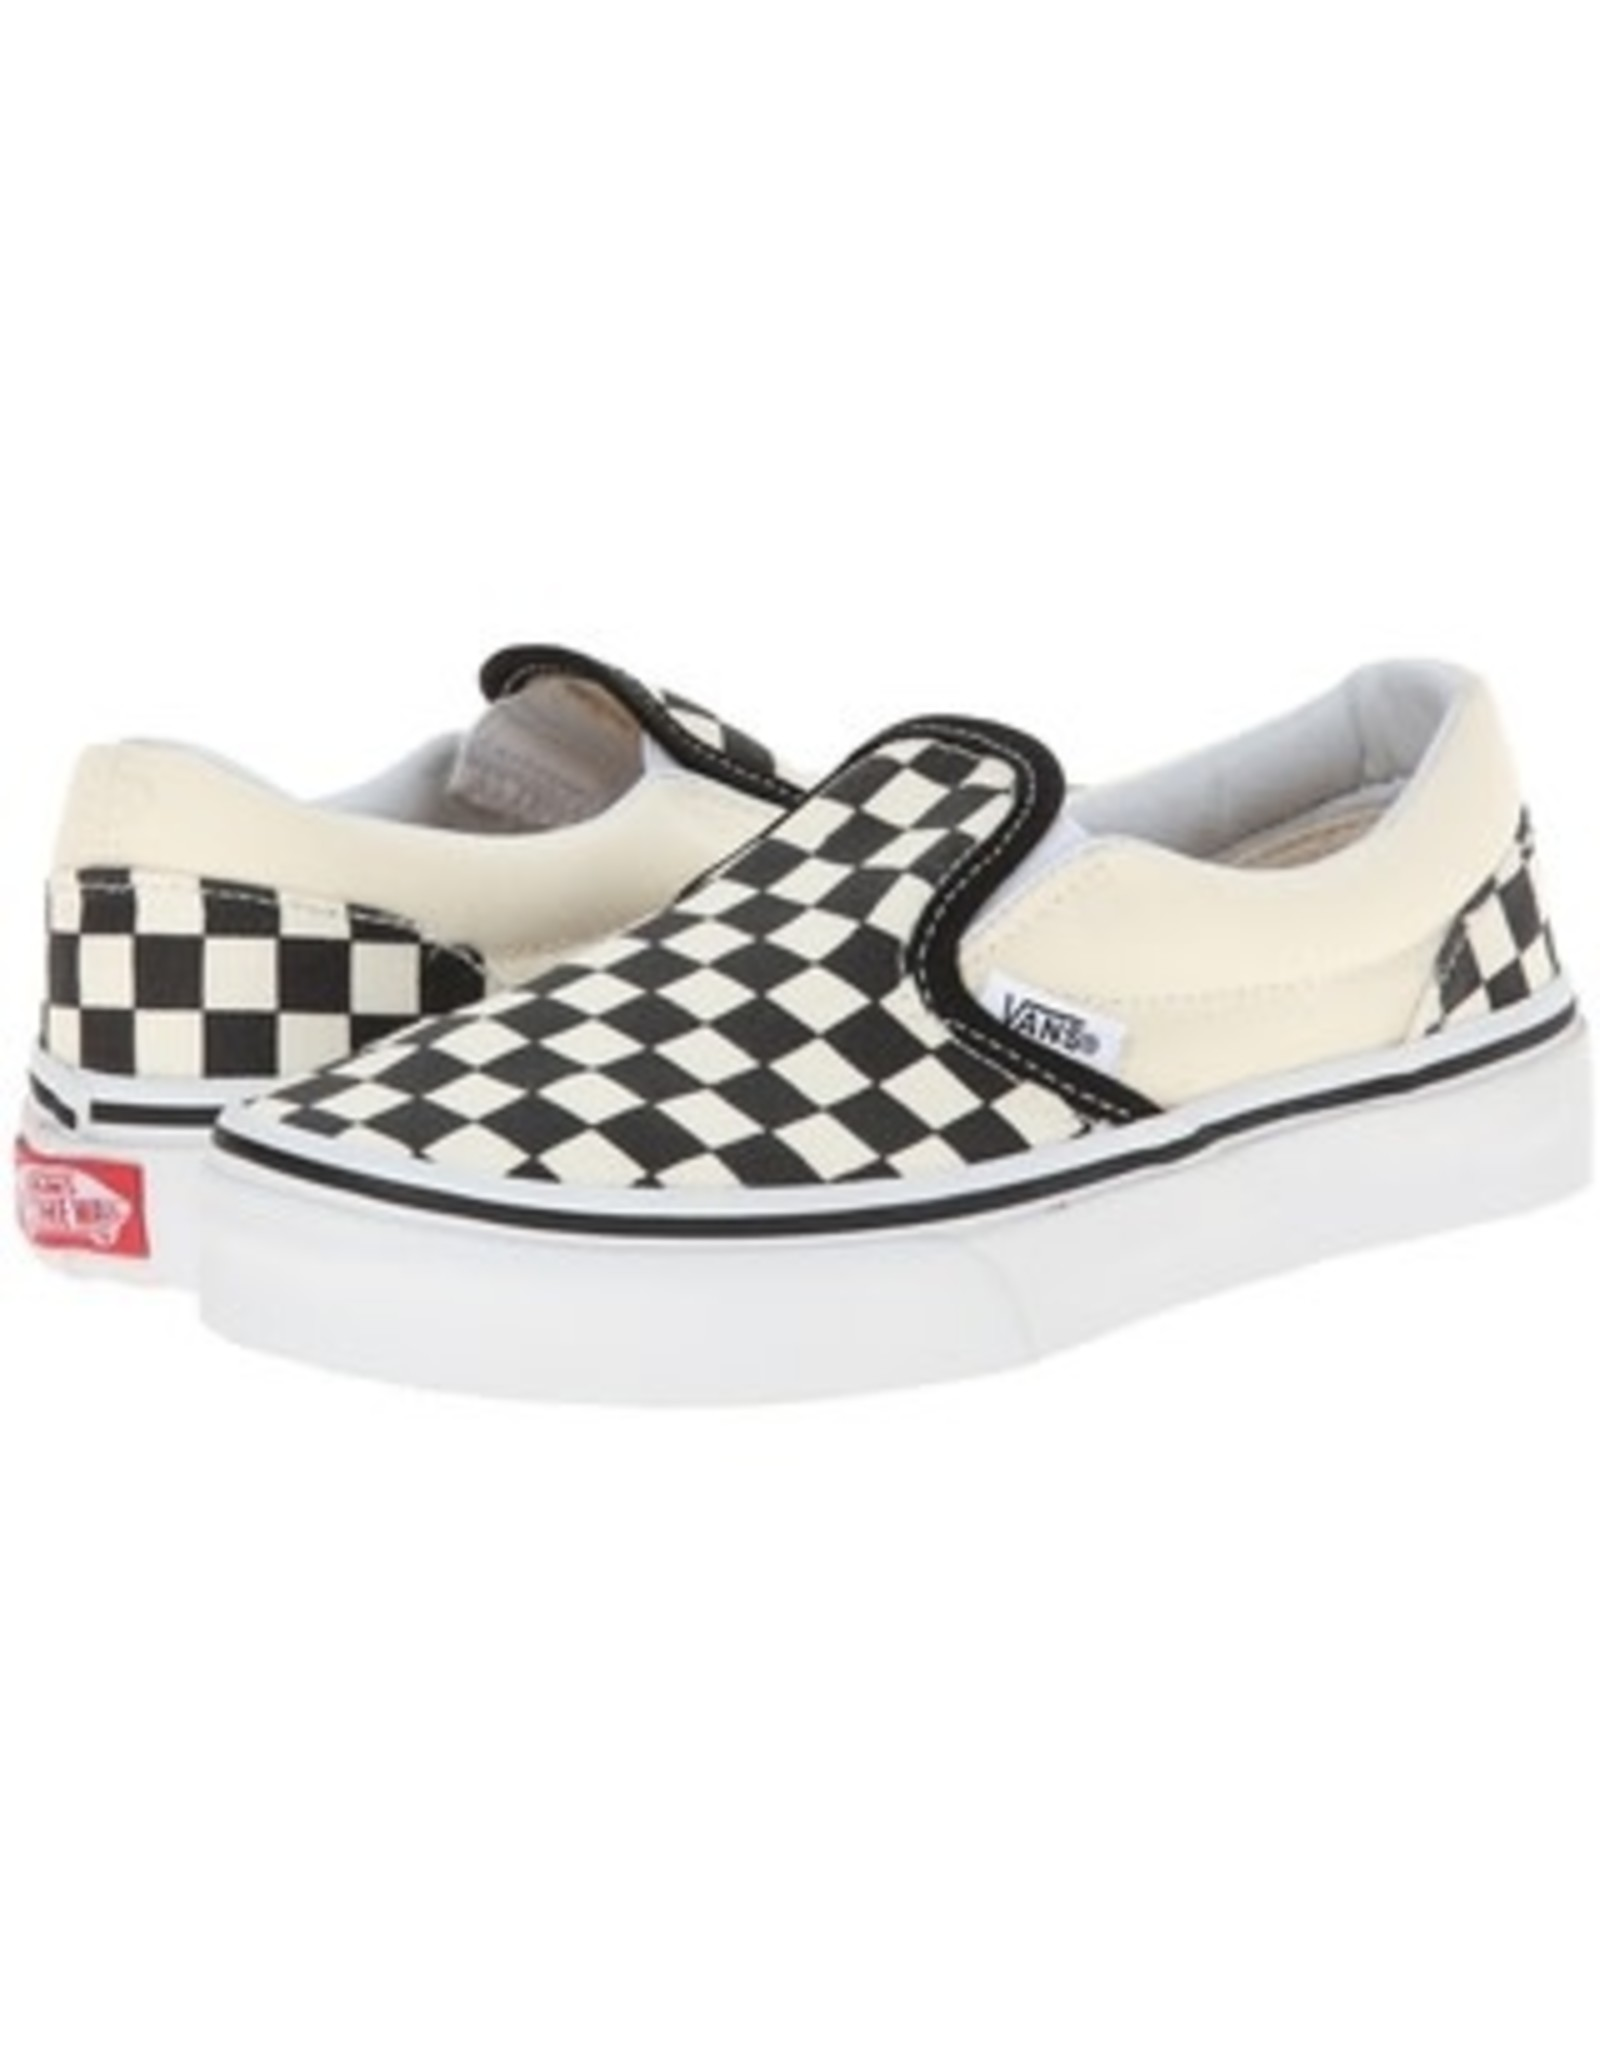 vans Vans - Soulier junior classic slip-on checkerboard black/white